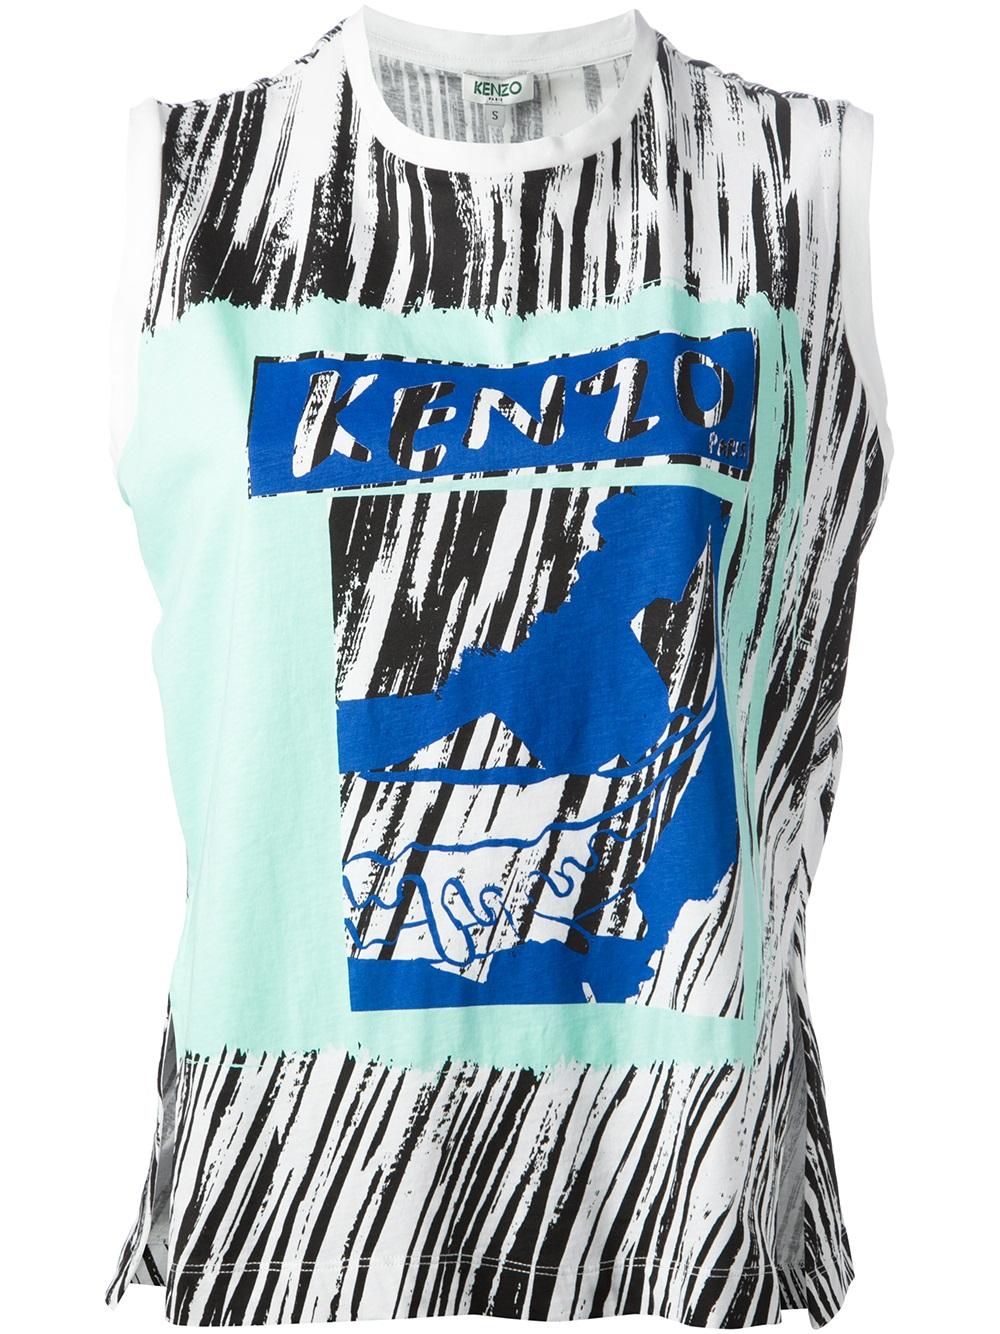 Kenzo Fish Print T Shirt In Blue Multicolour Lyst